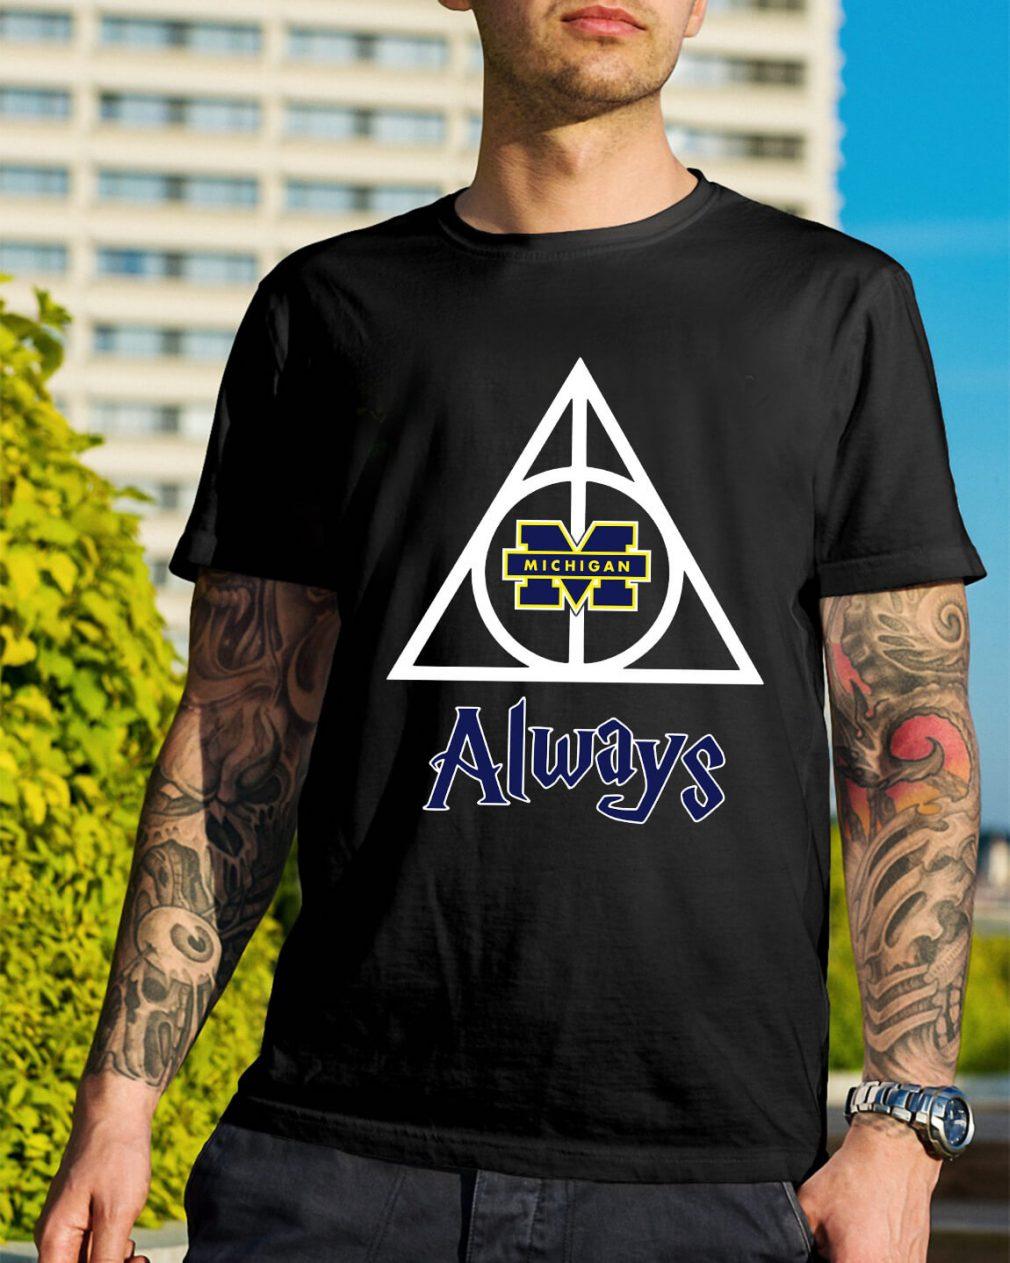 Michigan Wolverines Deathly Hallows always Harry Potter shirt